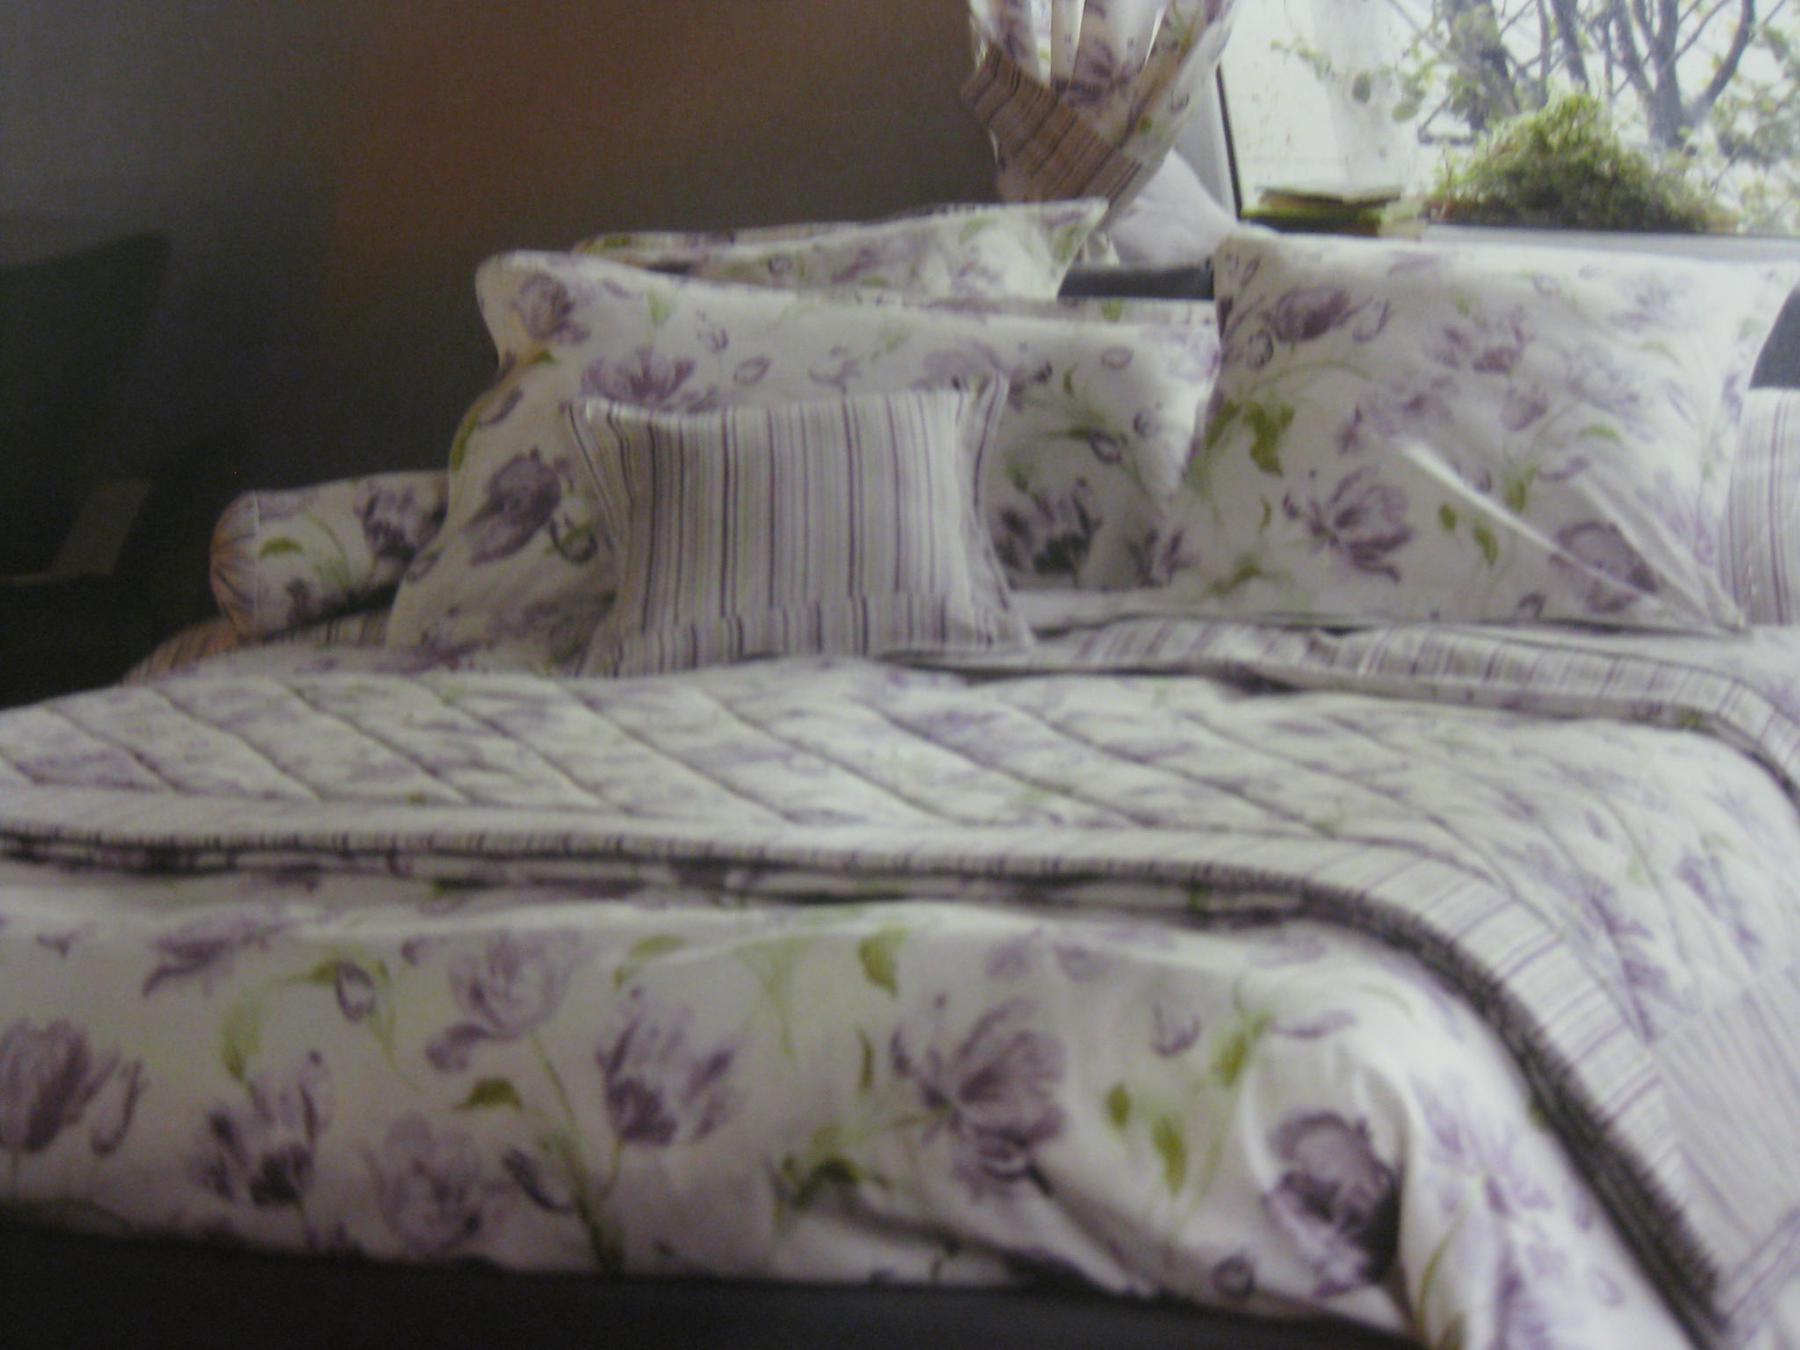 bettw sche laura ashley lakterton v8 mako satin garnitur amethyst div gr en kaufen bei. Black Bedroom Furniture Sets. Home Design Ideas